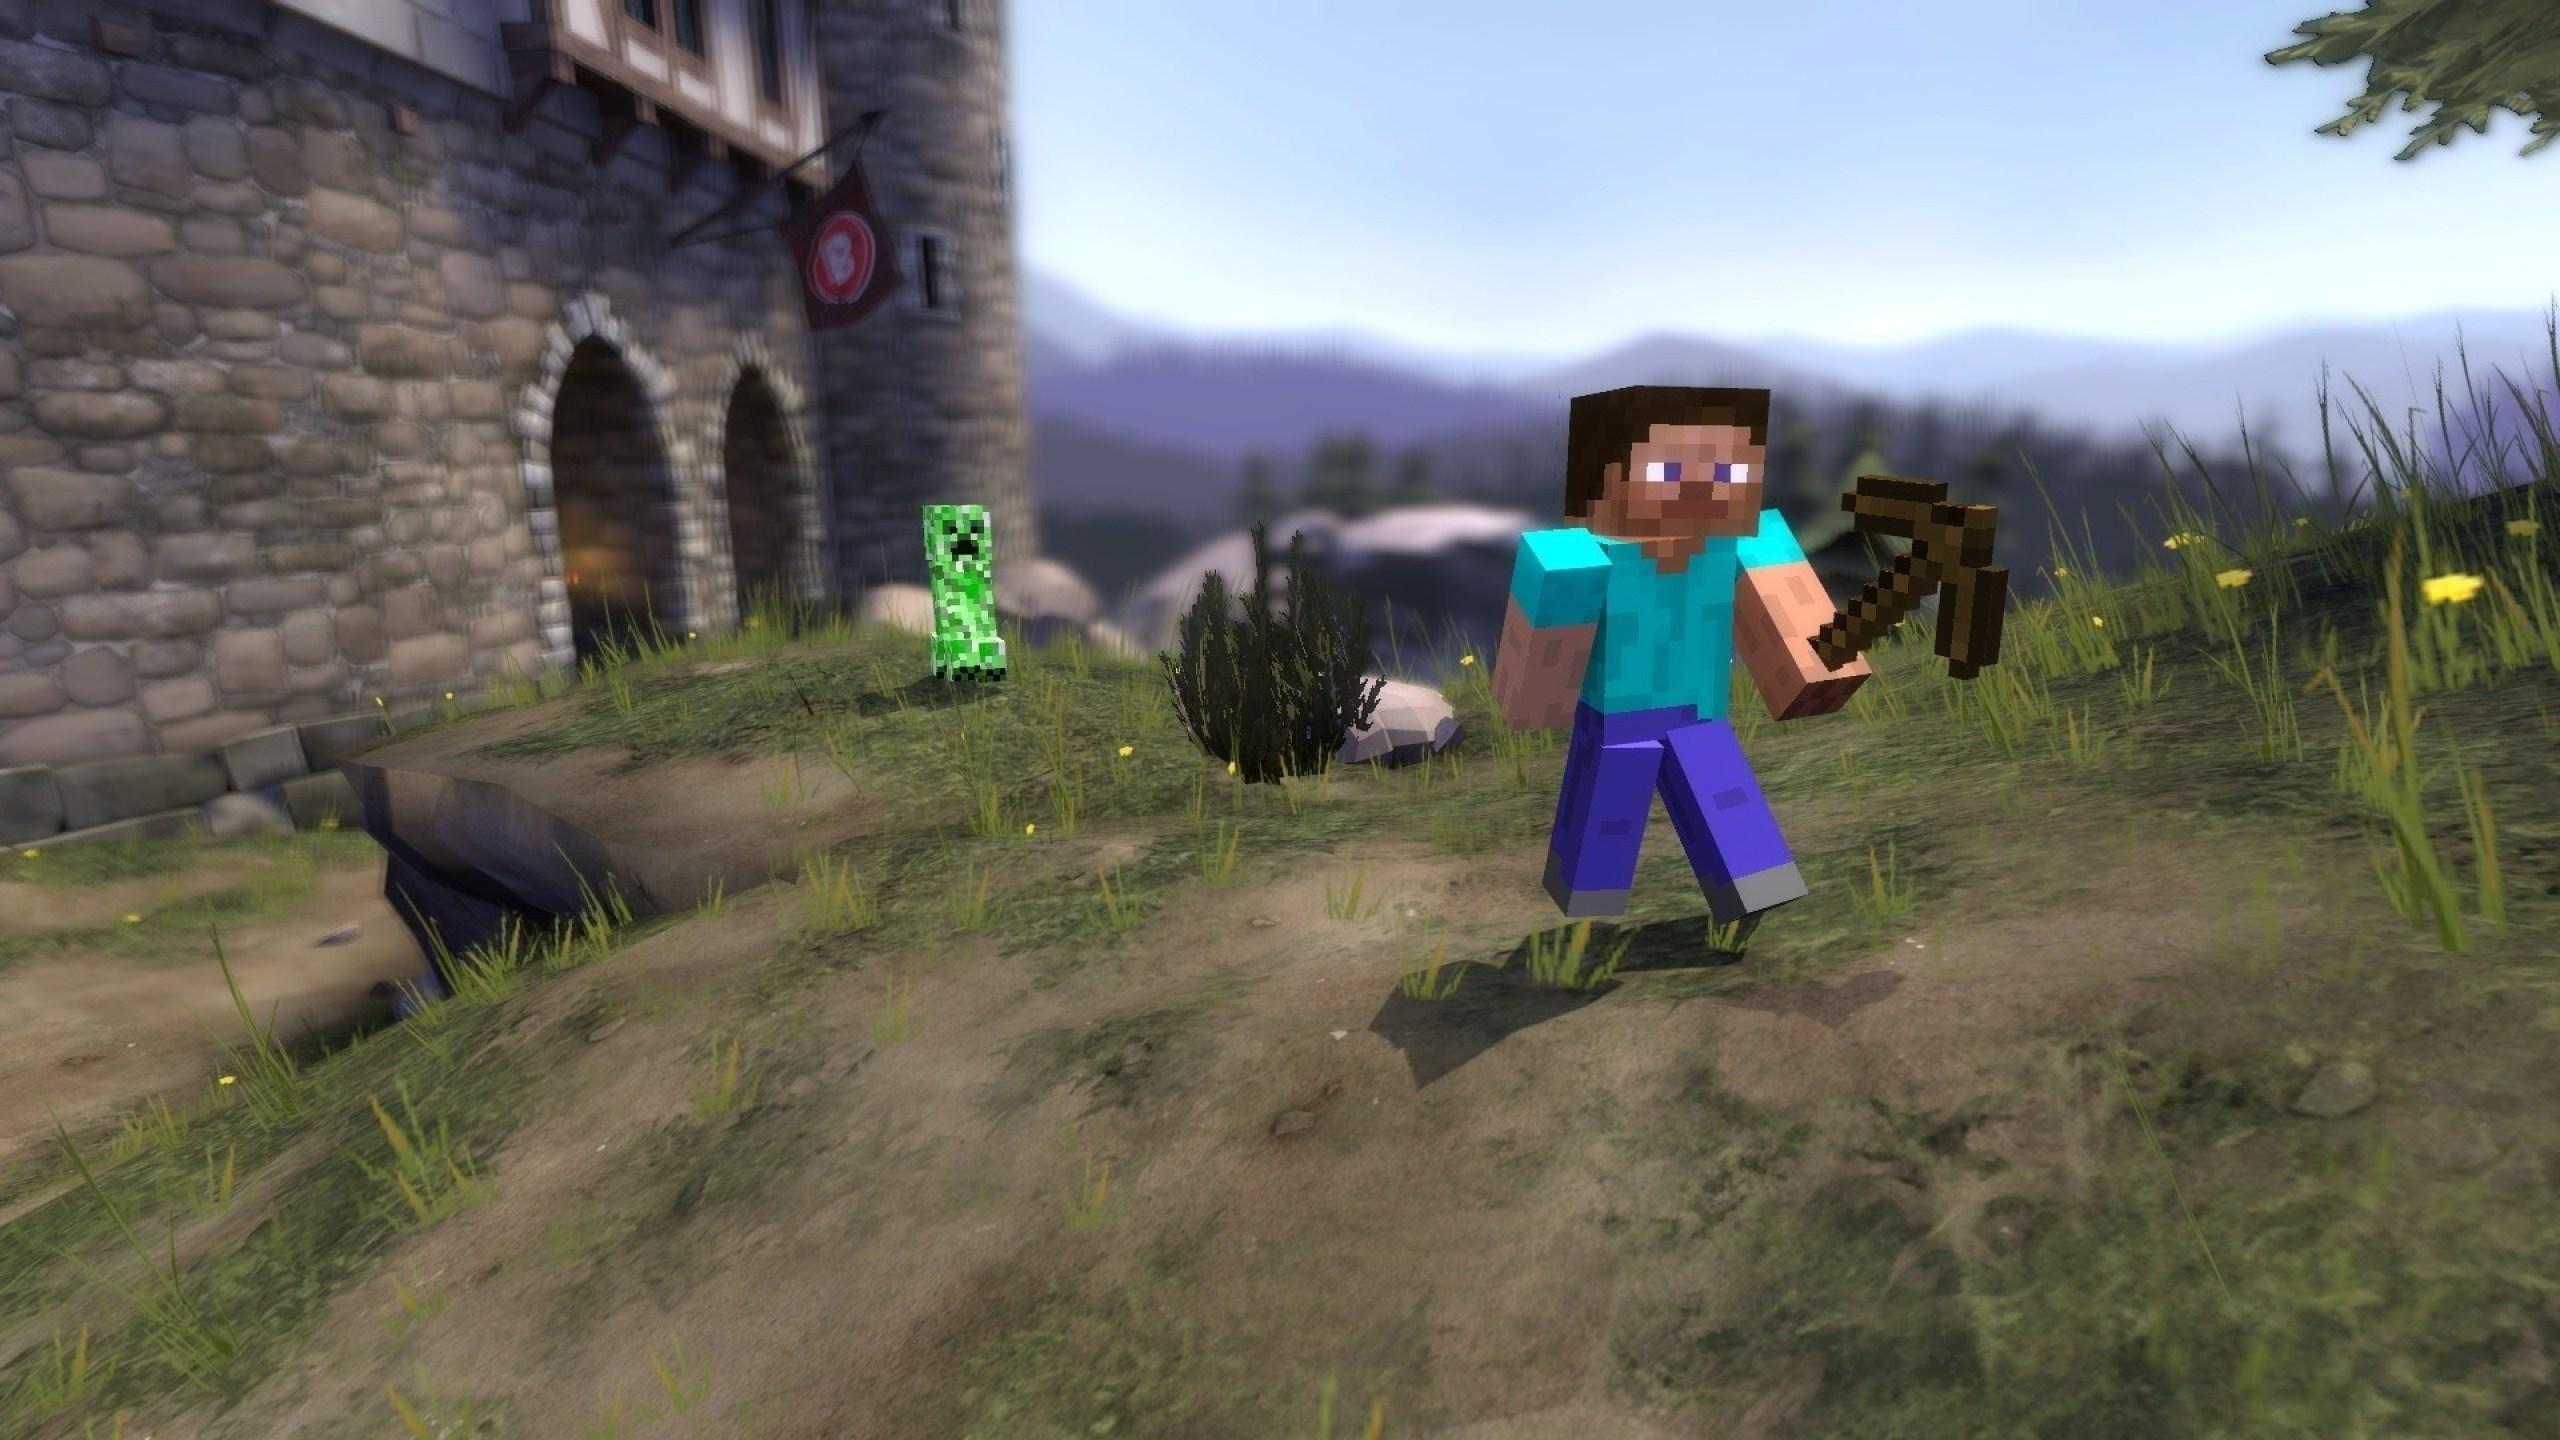 Minecraft Gmod Background 943329 Hd Wallpaper Backgrounds